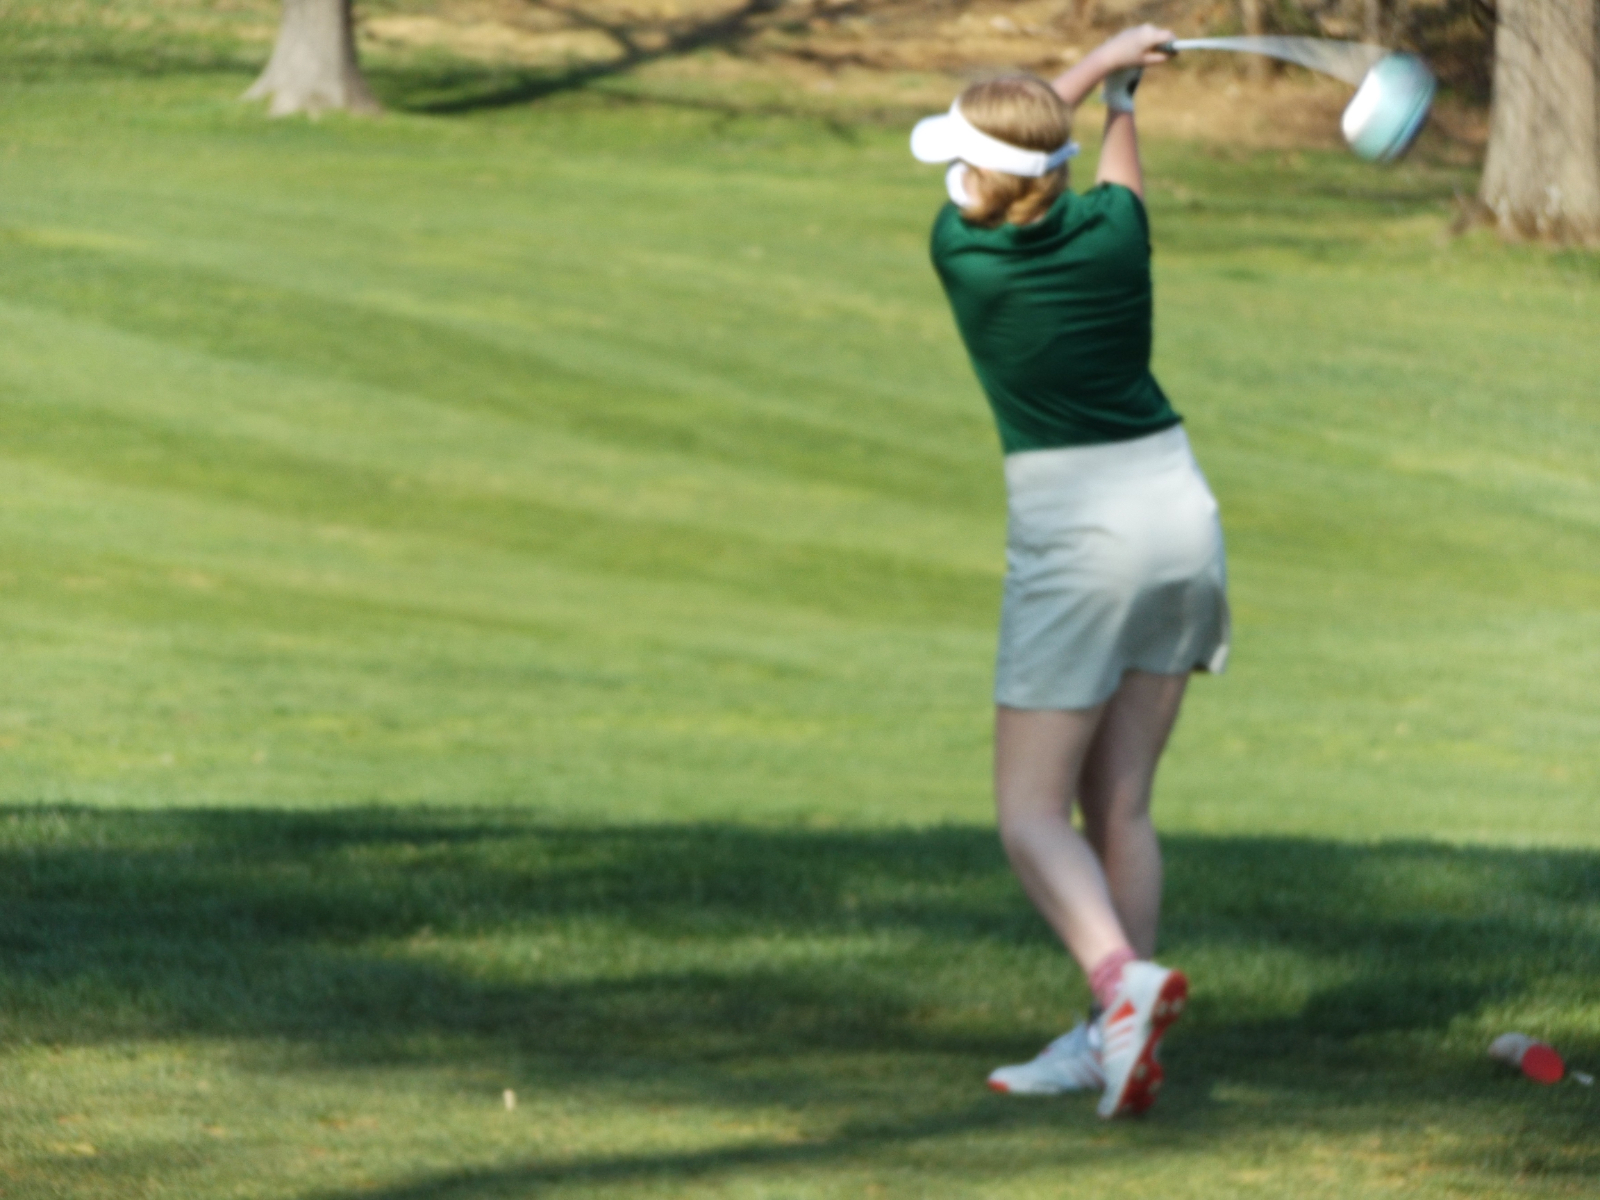 Golf Photo Gallery